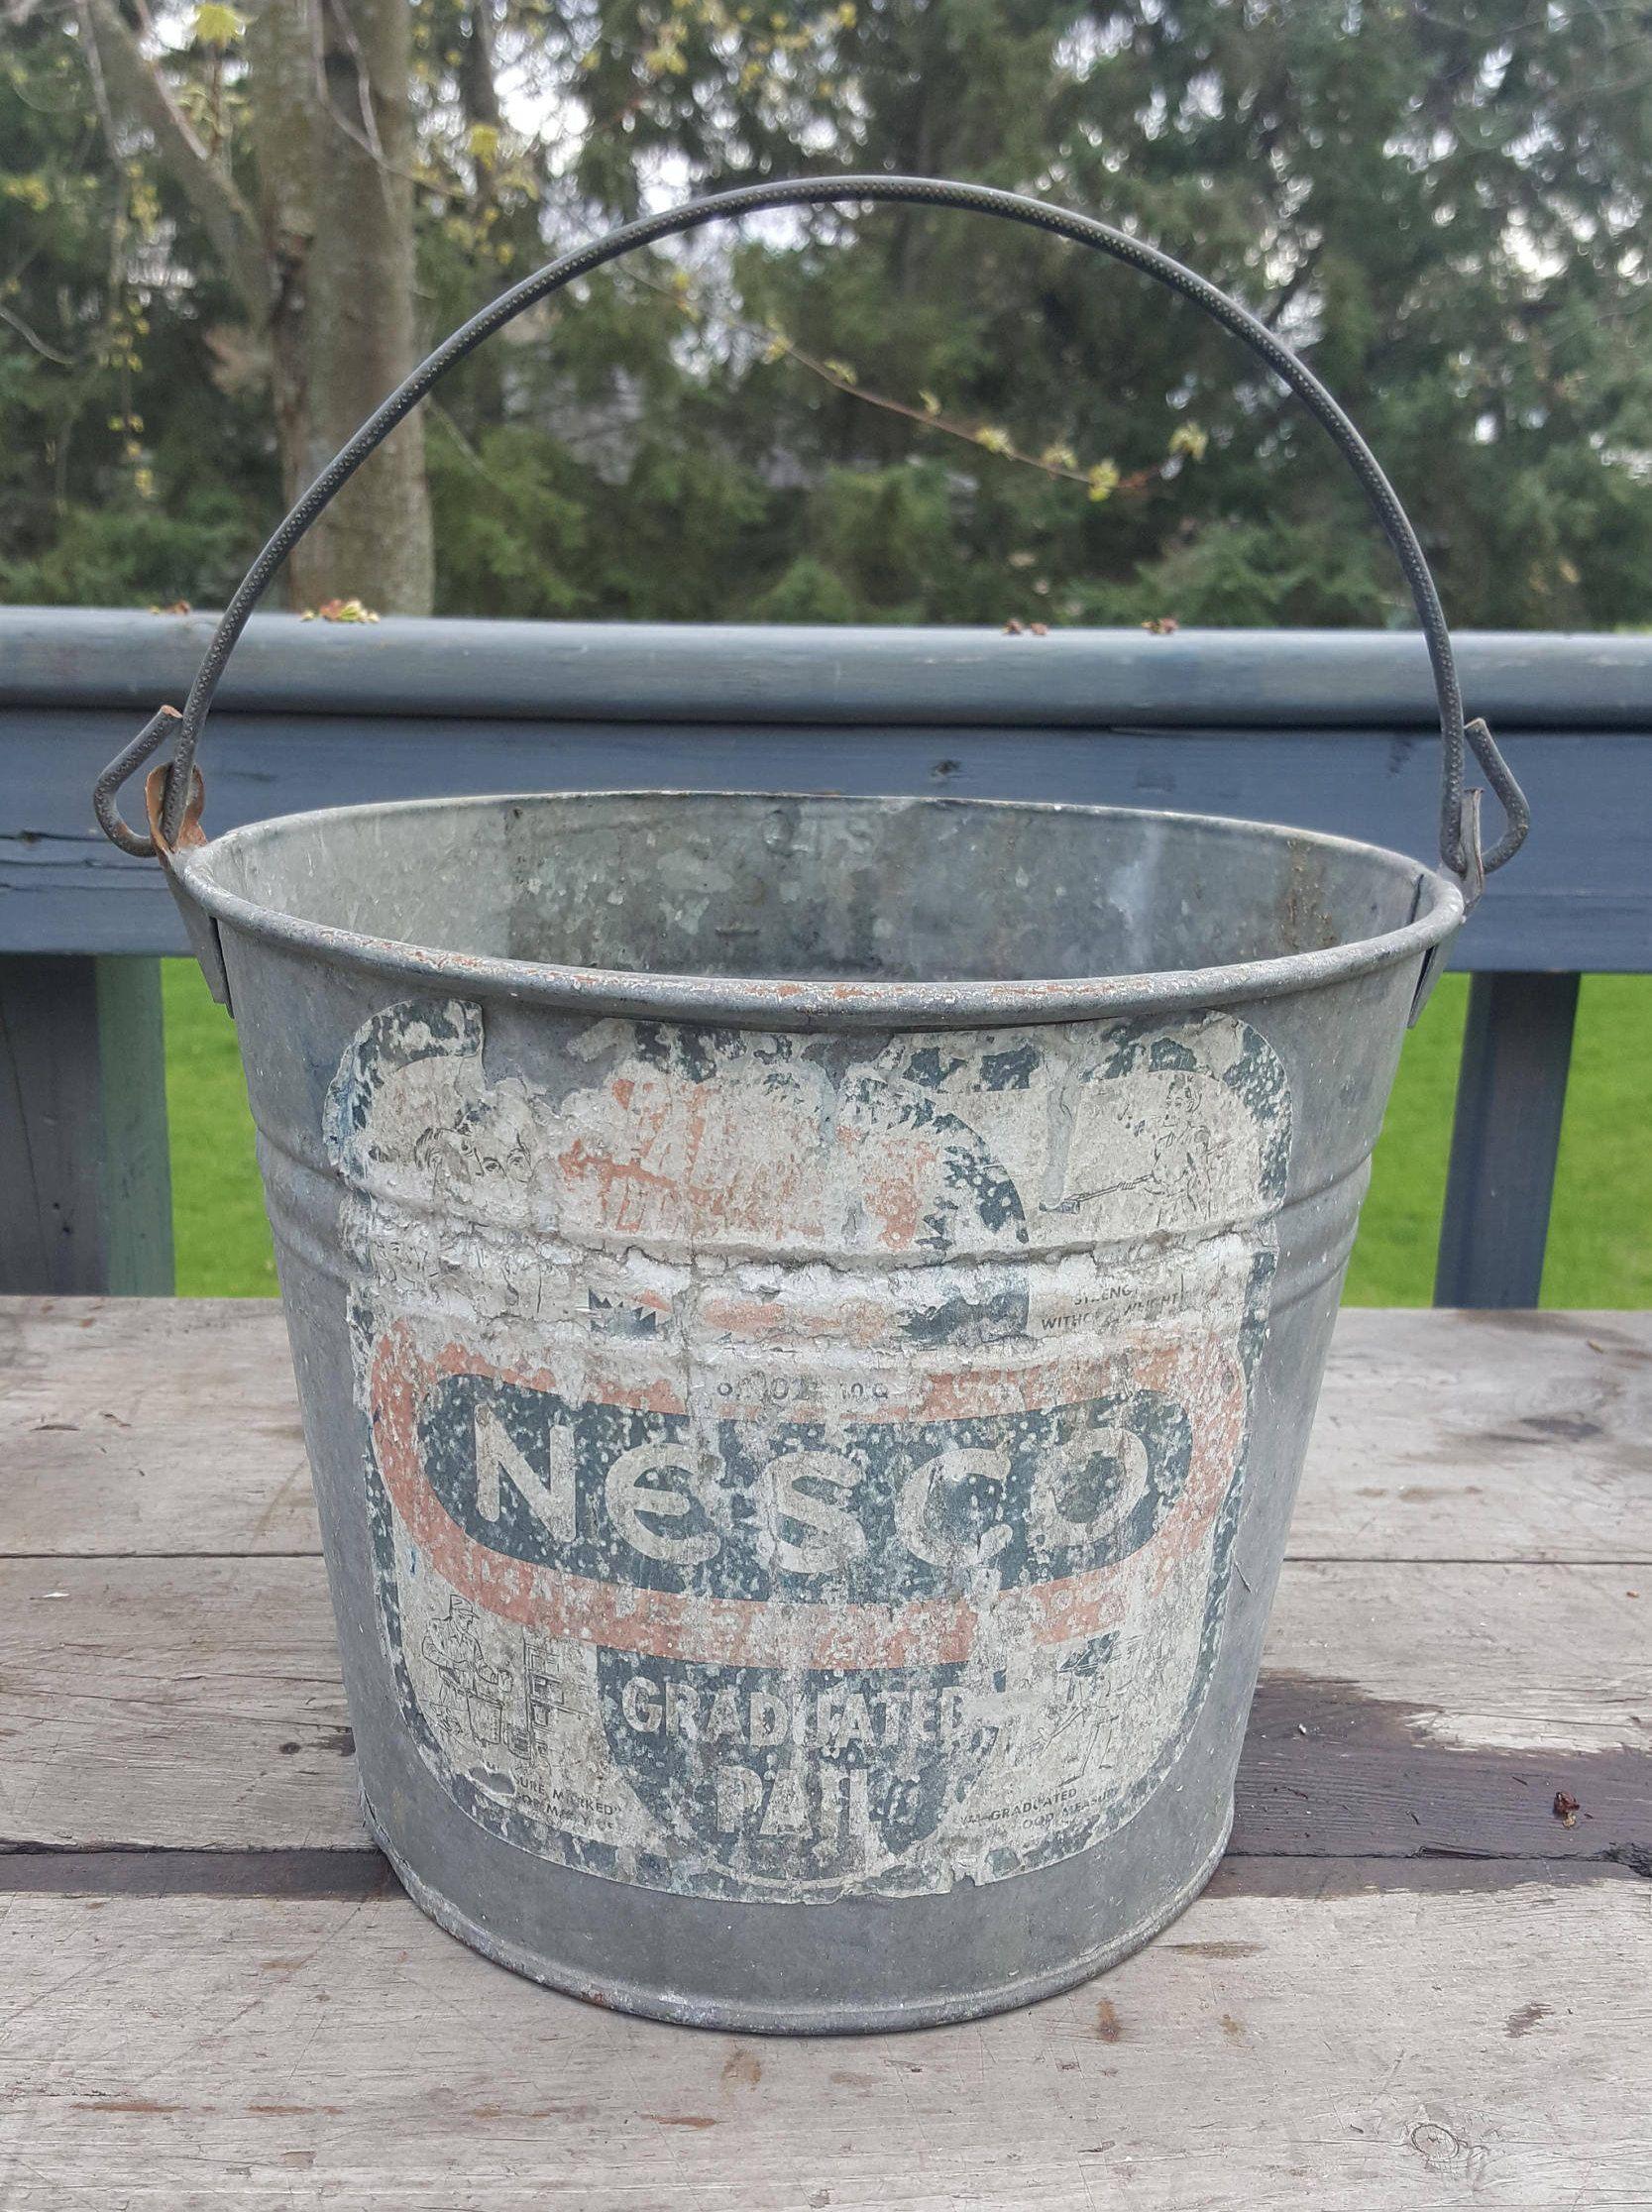 Beverage Holder Decor Wood Vintage Metal Industrial Farmhouse Chic Pail Planter